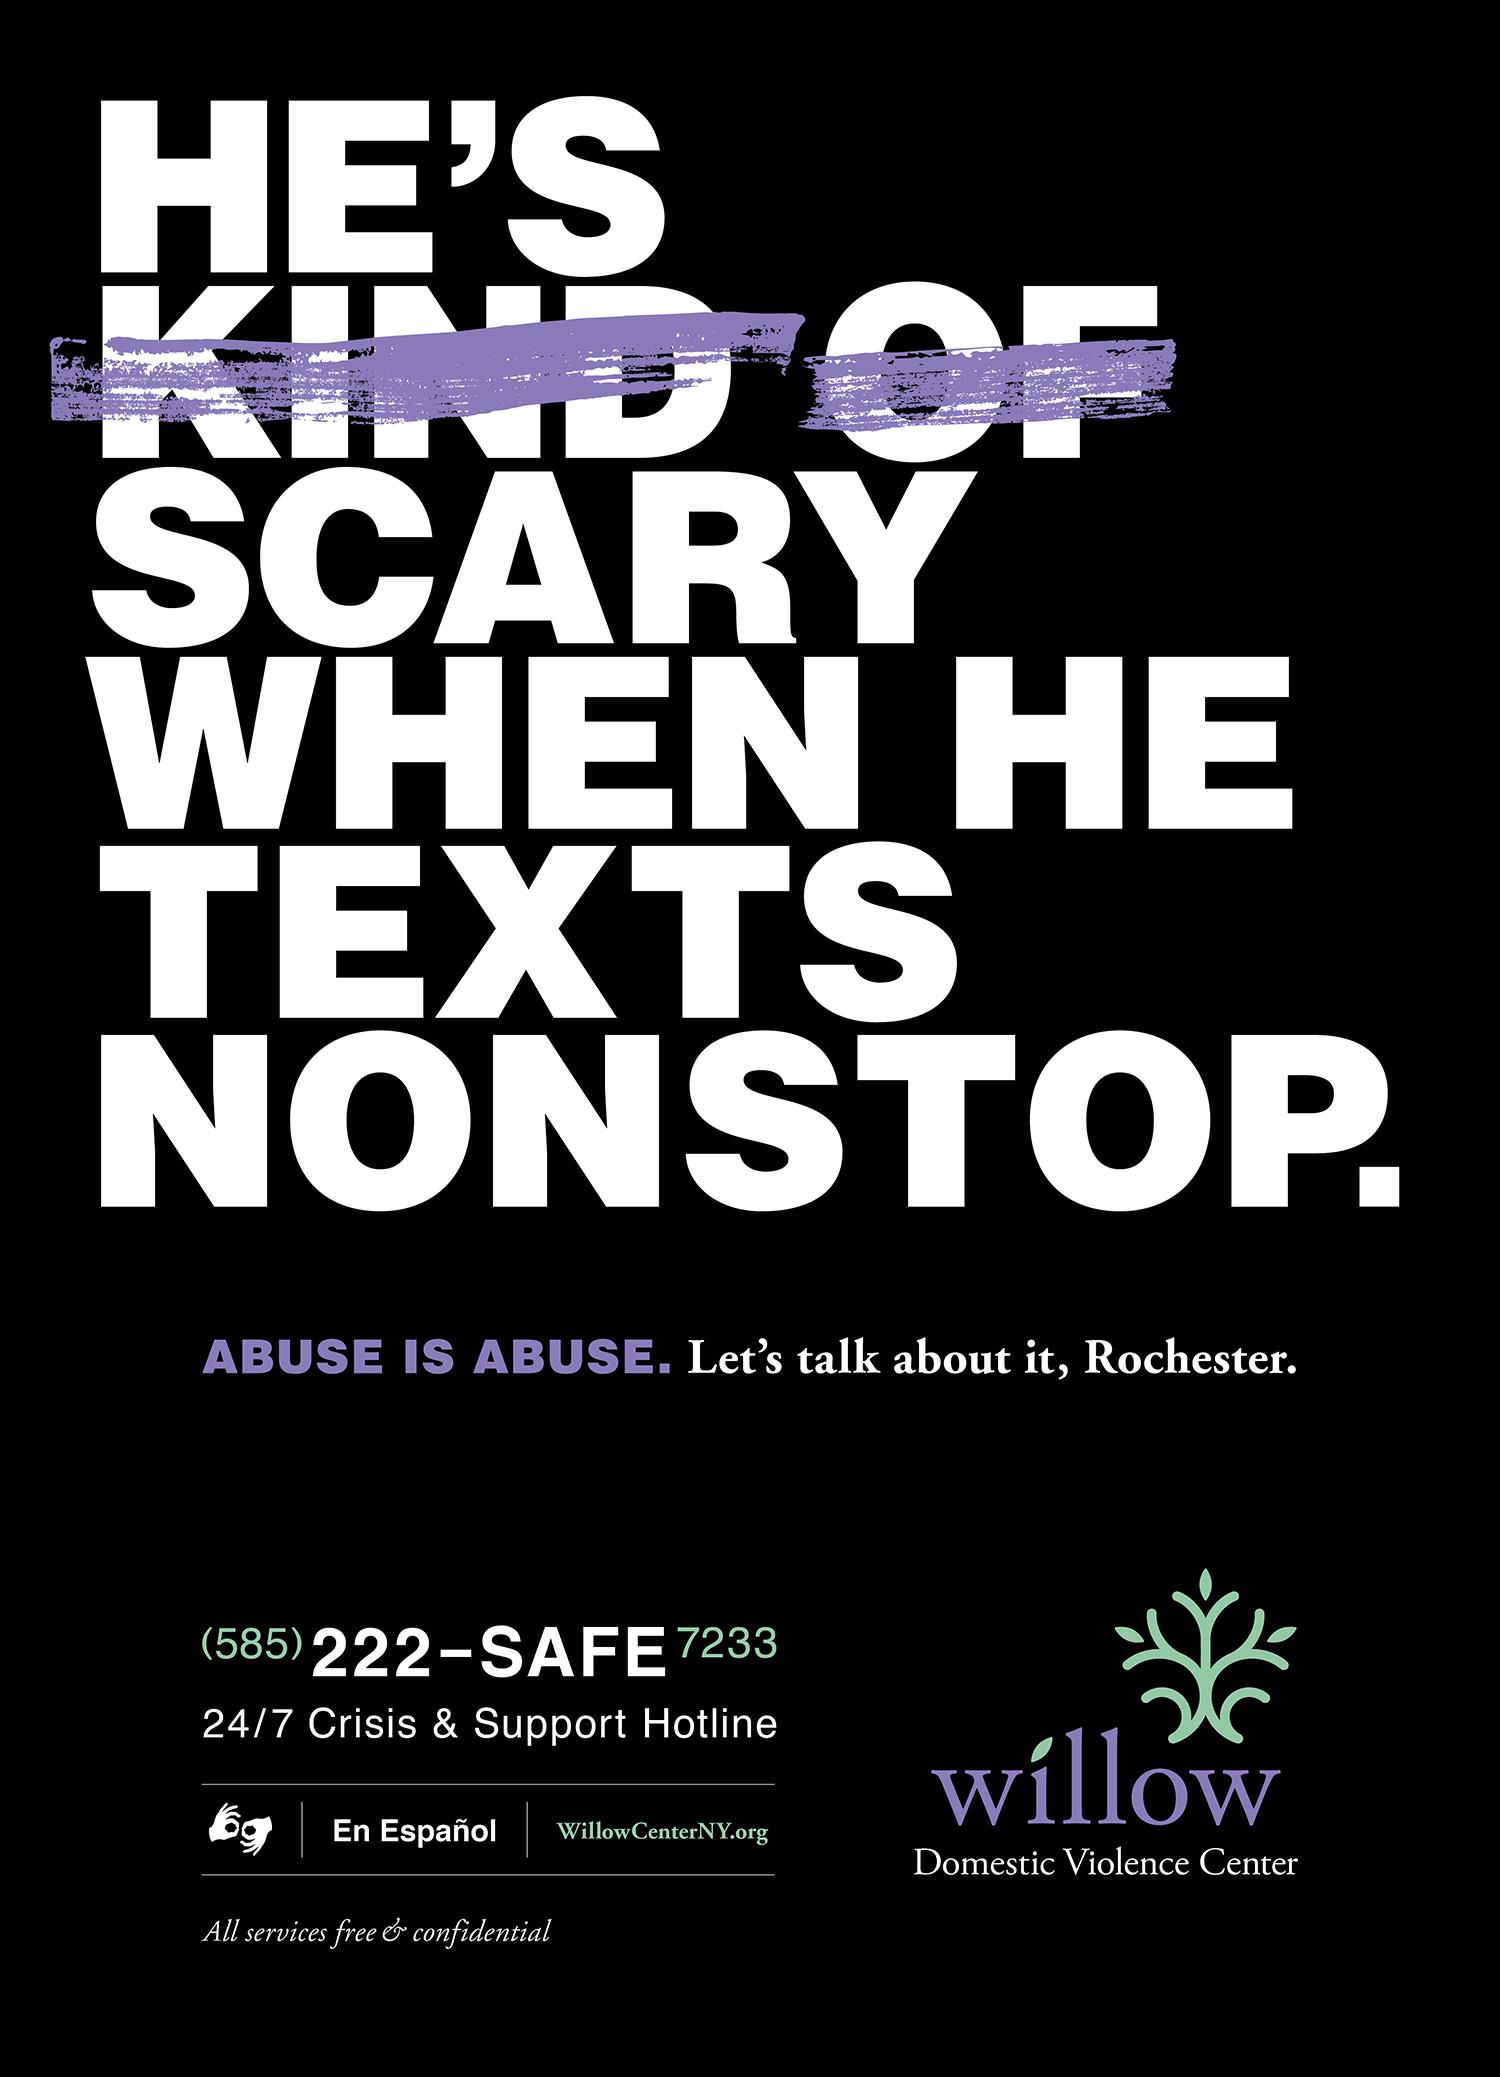 Willow_13x18_Poster_Text_ROC_purple_green_lite.jpg